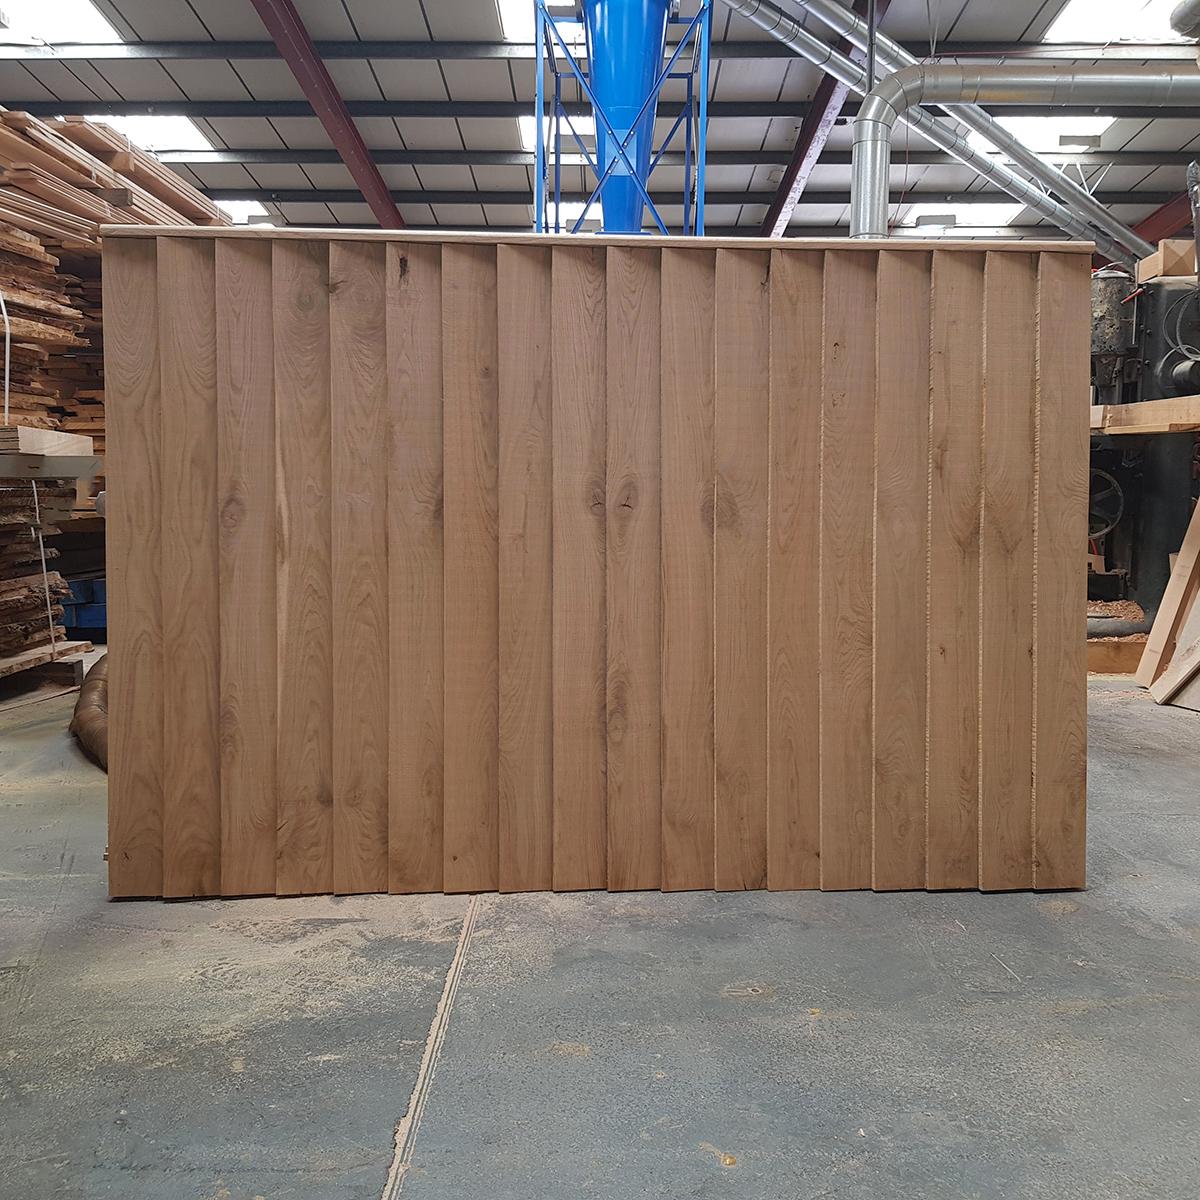 fencing panels and posts buy oak featheredge fence panel. Black Bedroom Furniture Sets. Home Design Ideas